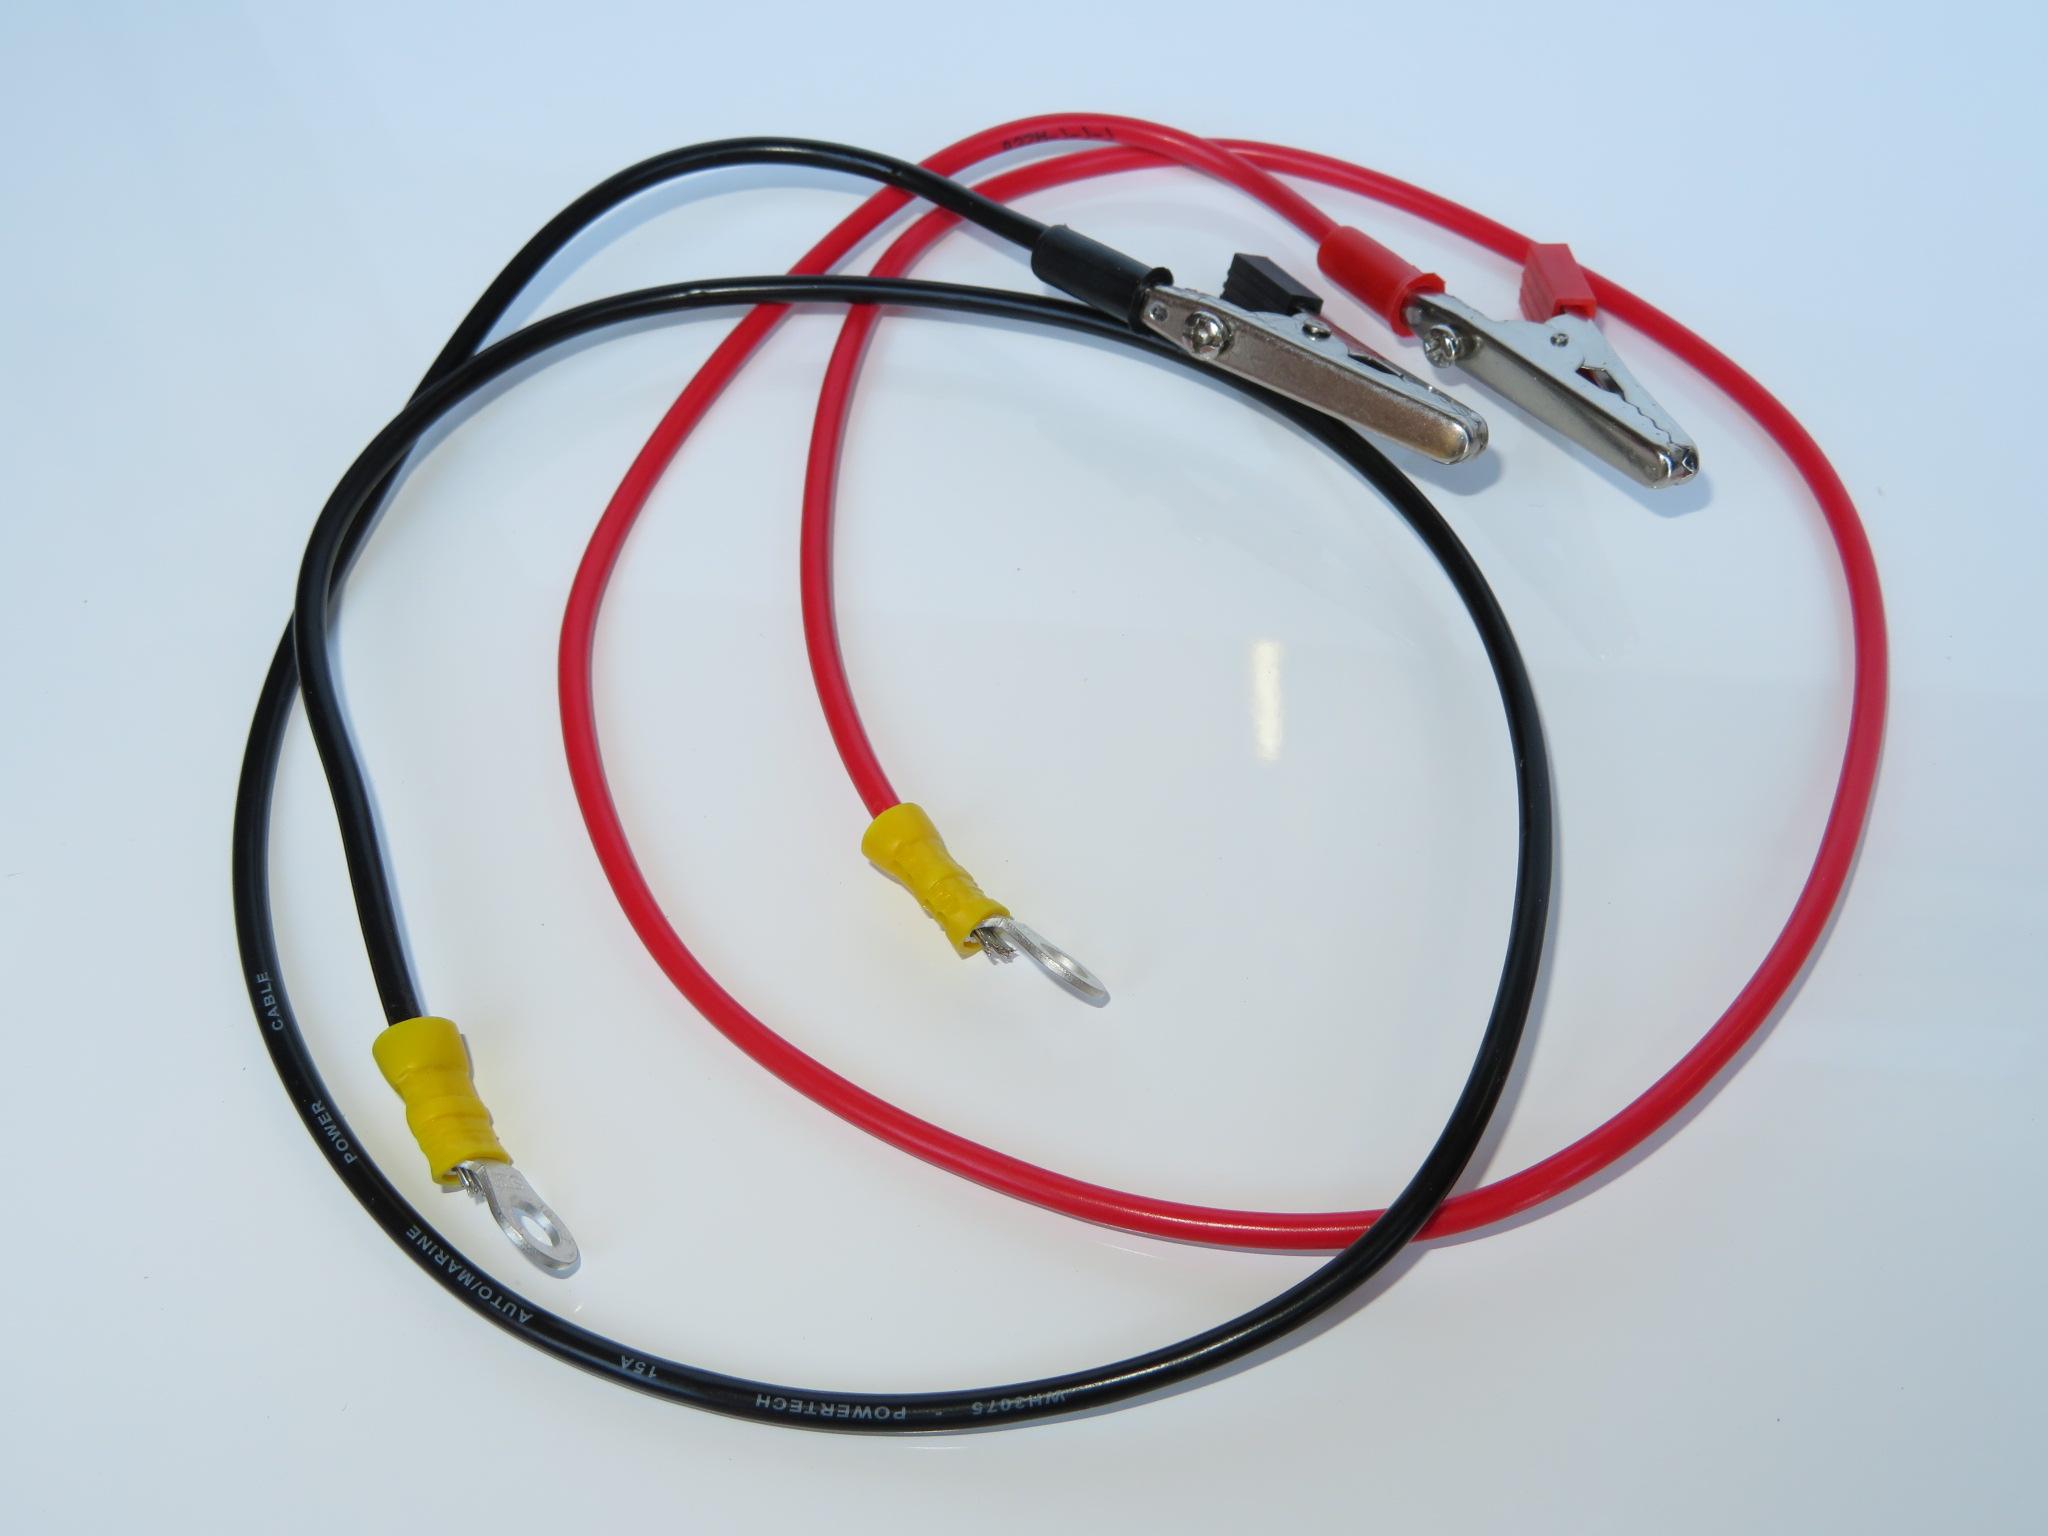 Power Supply Wire 15 Amp Jane Kits Wiring